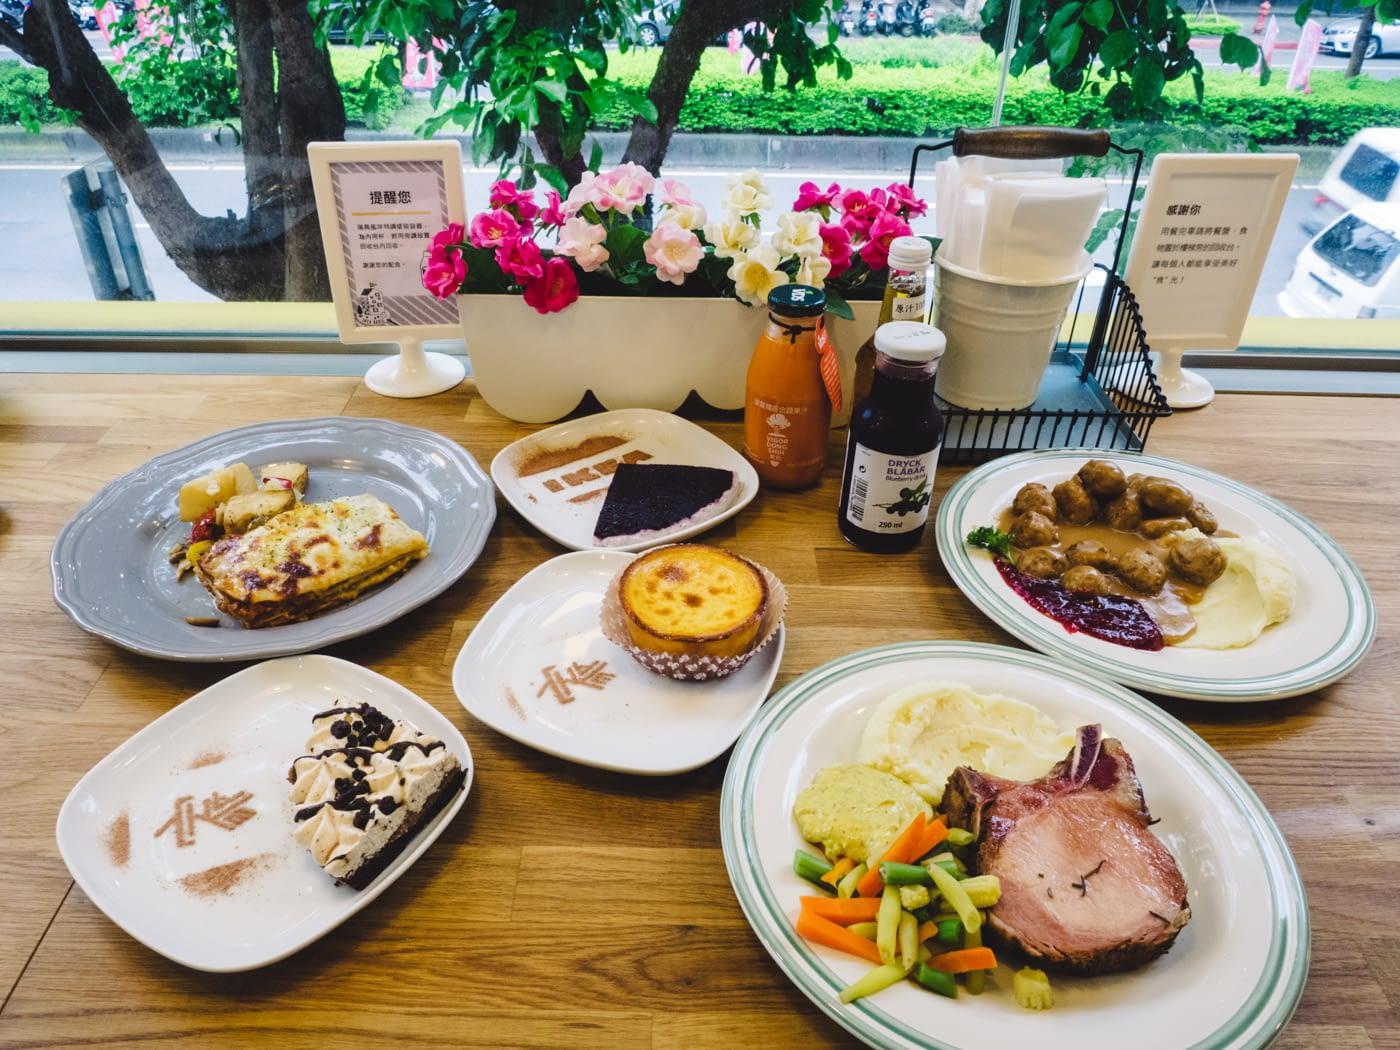 Taiwan - Taipei - Ikea food was yummy!